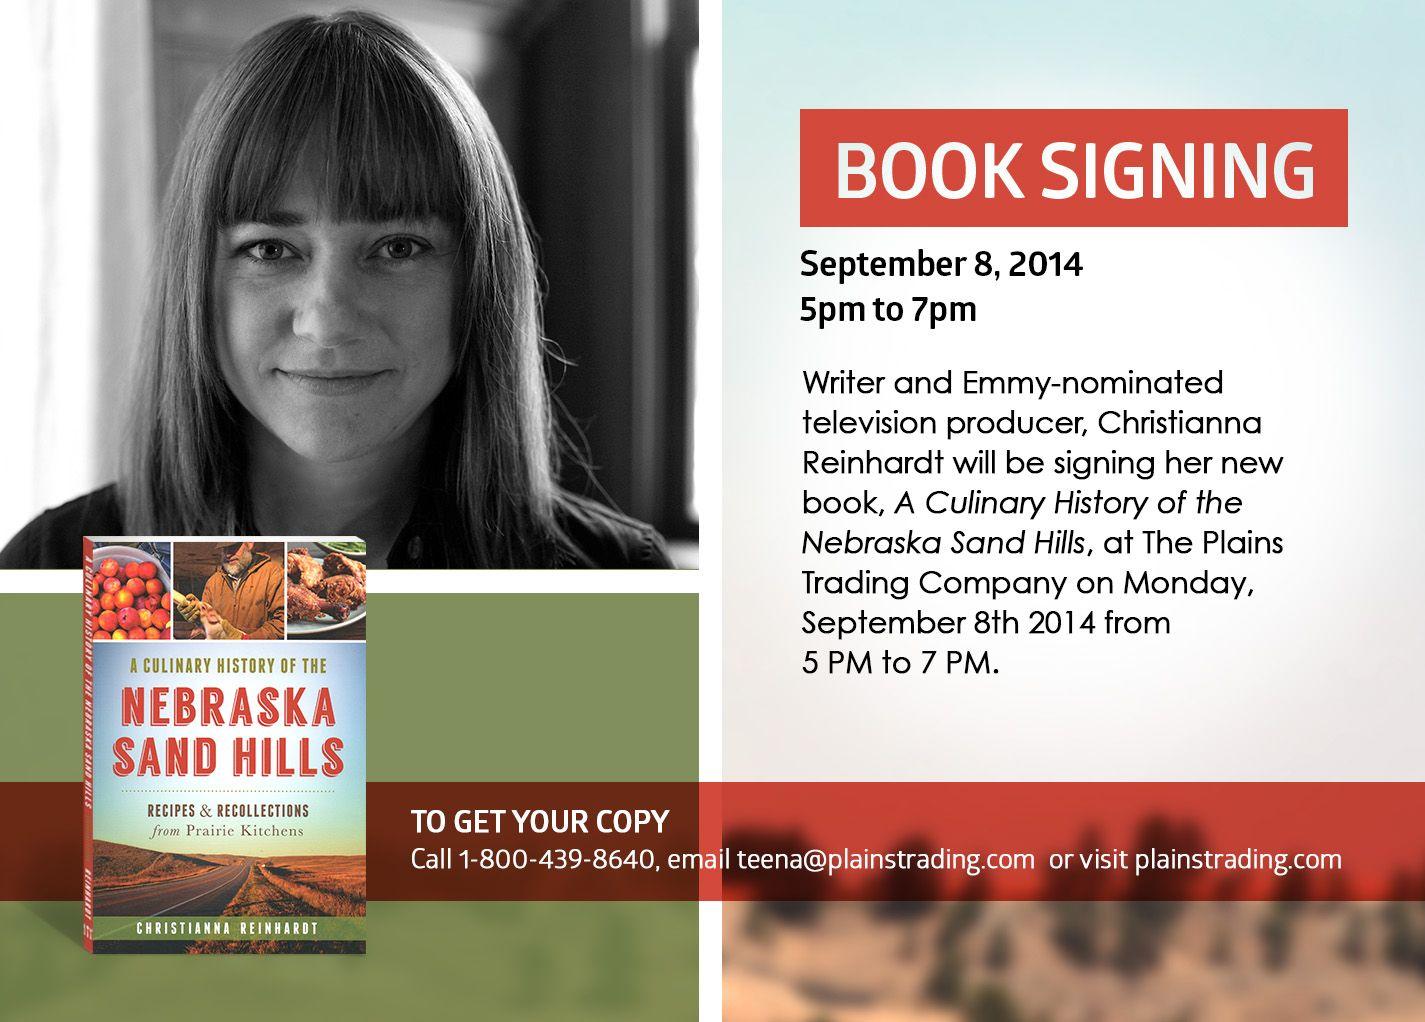 Book signing September 8, 2014